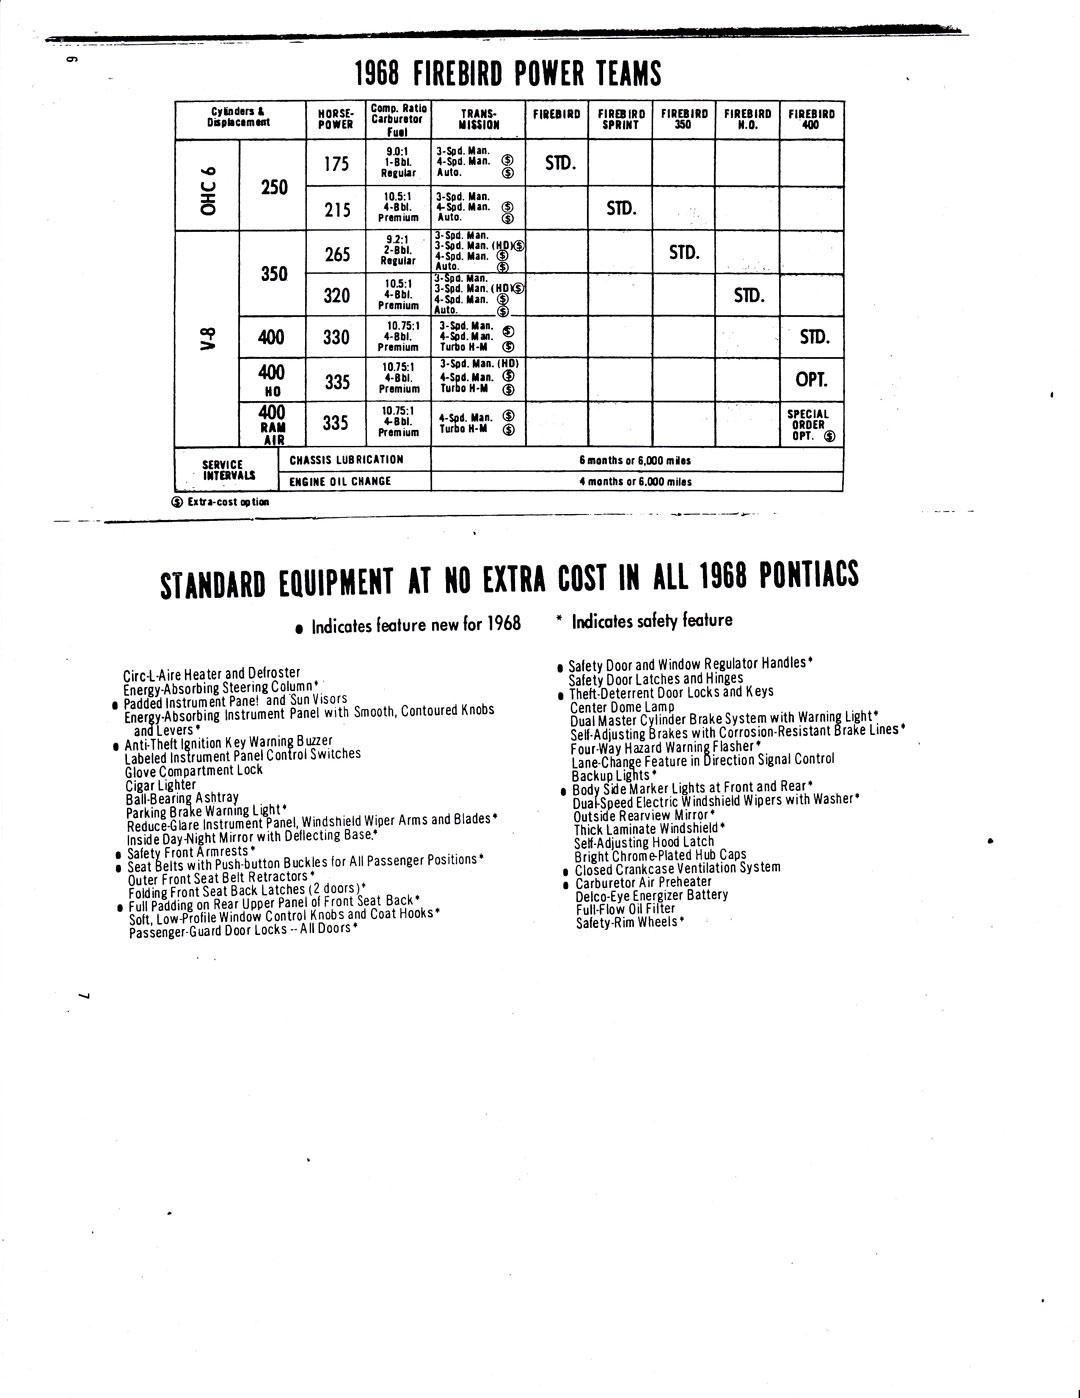 pontiac historic services documentation